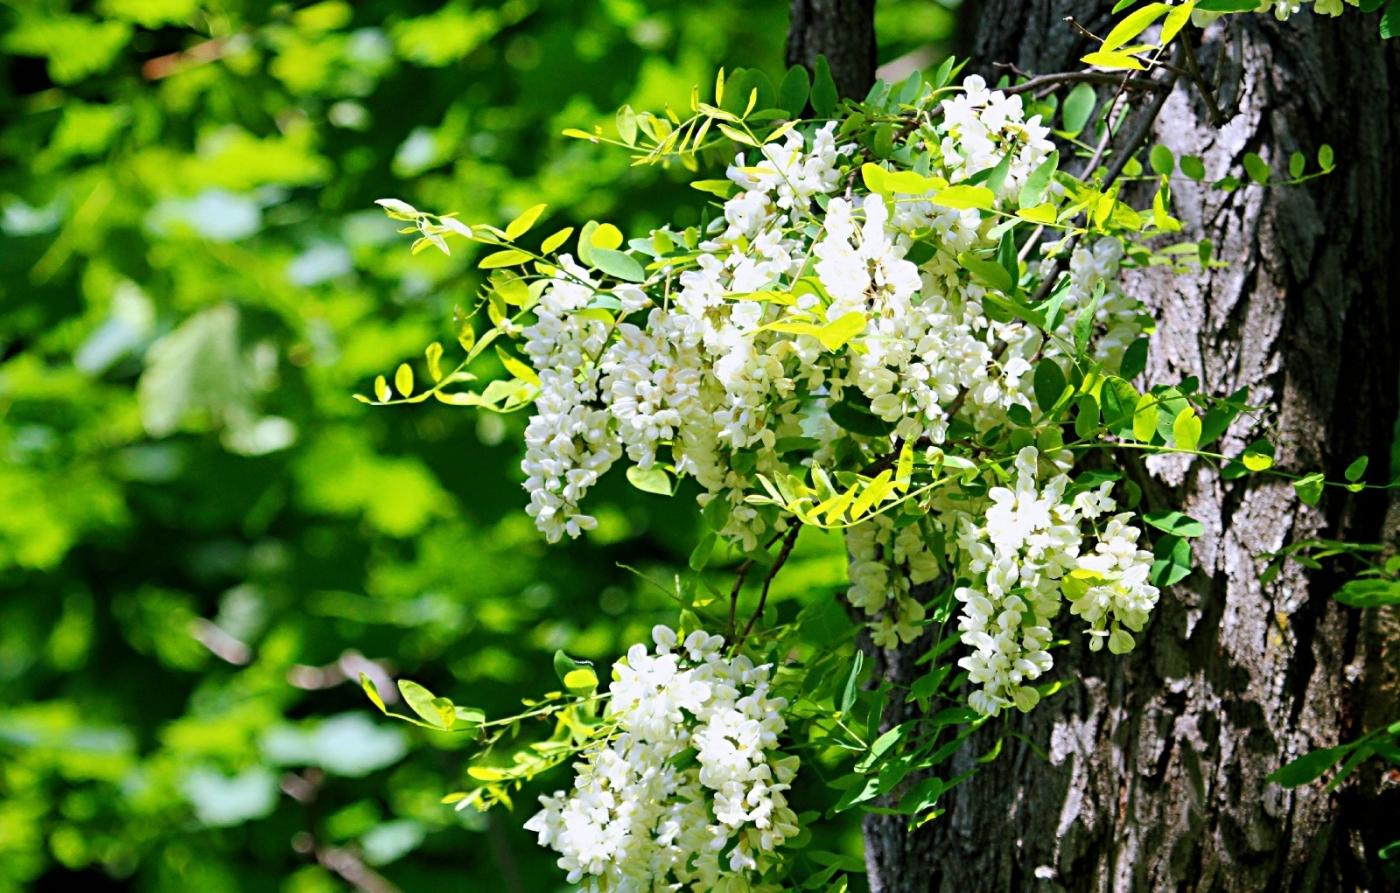 【田螺随拍】美国黄杨american yellowwood_图1-3